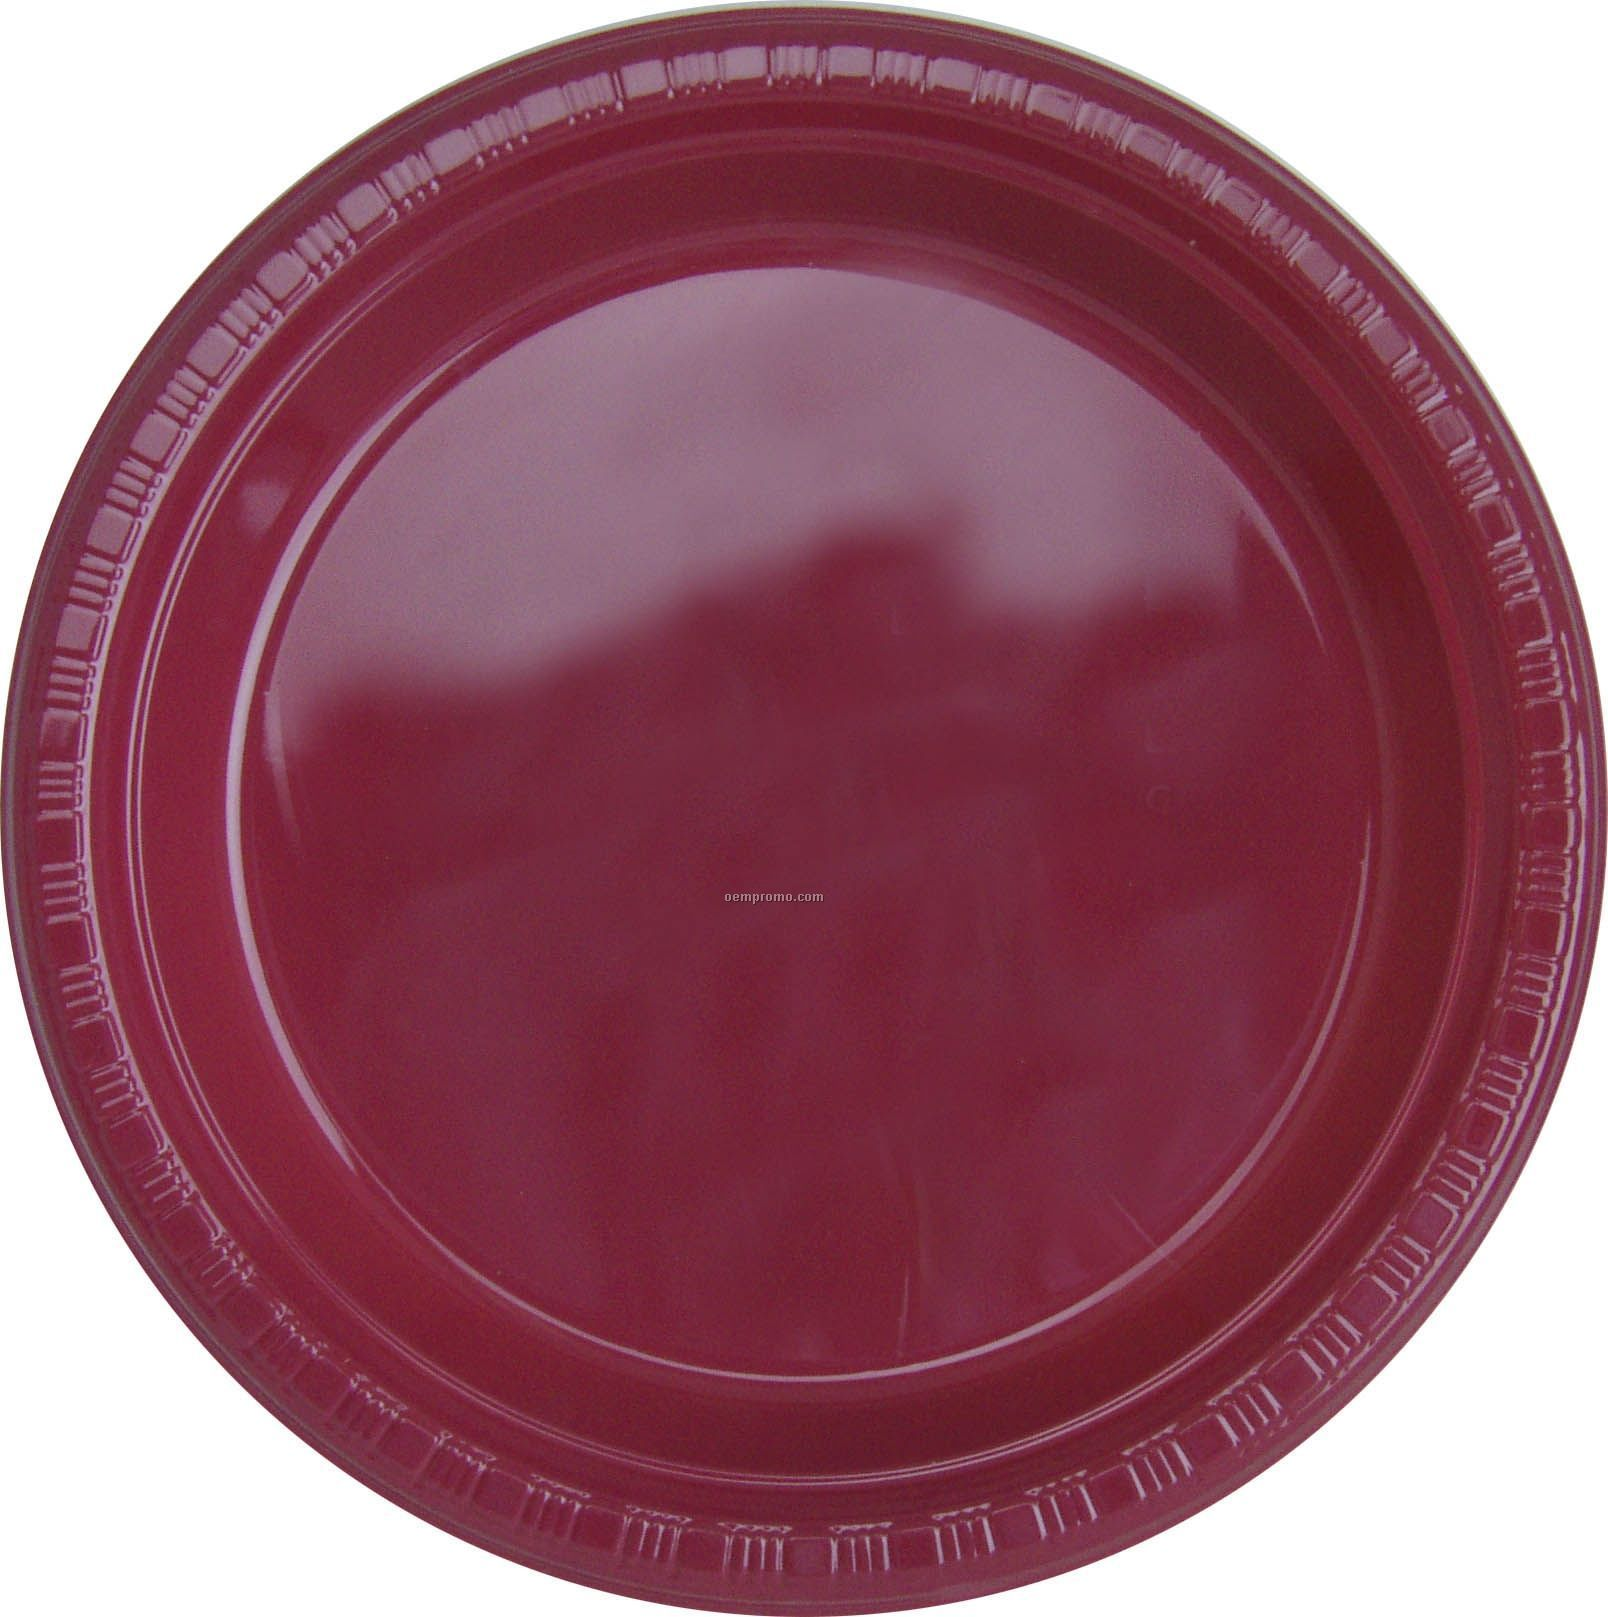 "Colorware 9"" Burgundy Royale Red Plastic Plate"